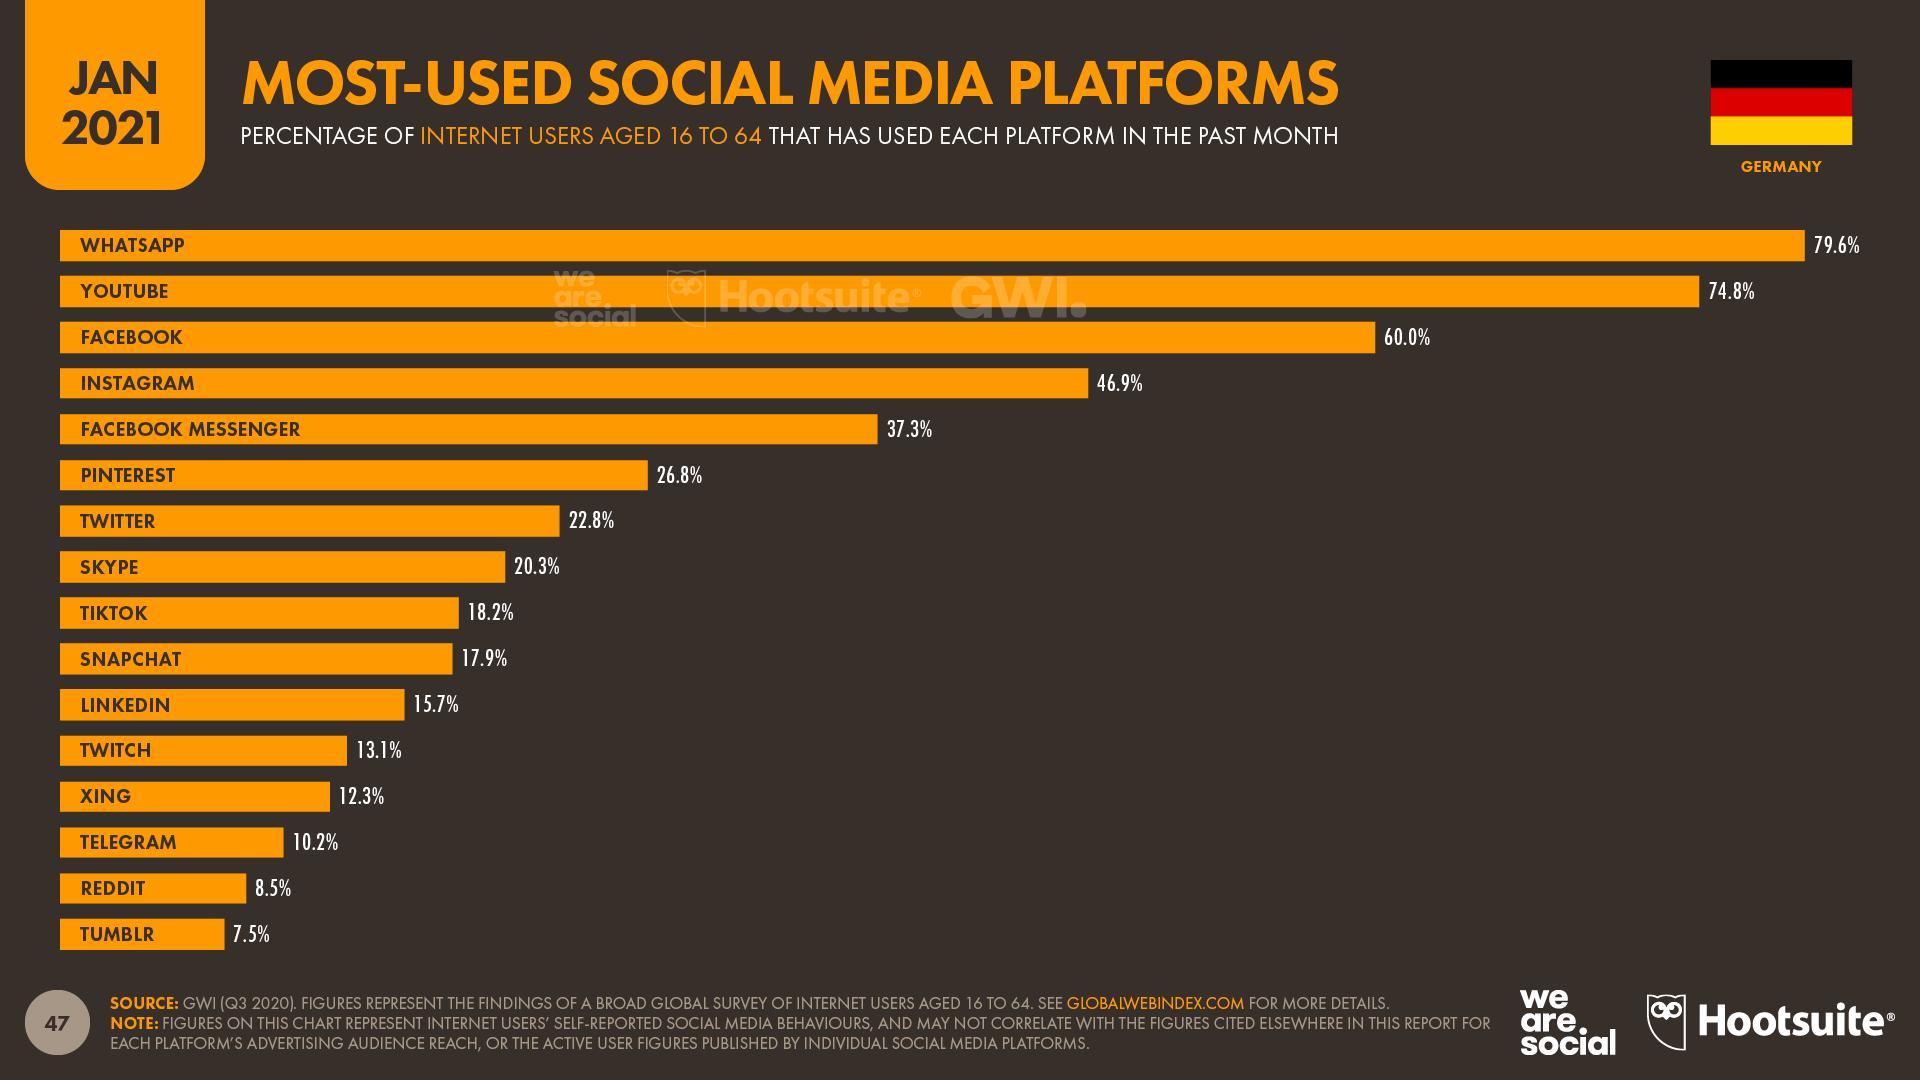 Statistik der am häufigsten genutzten Social Media Plattformen